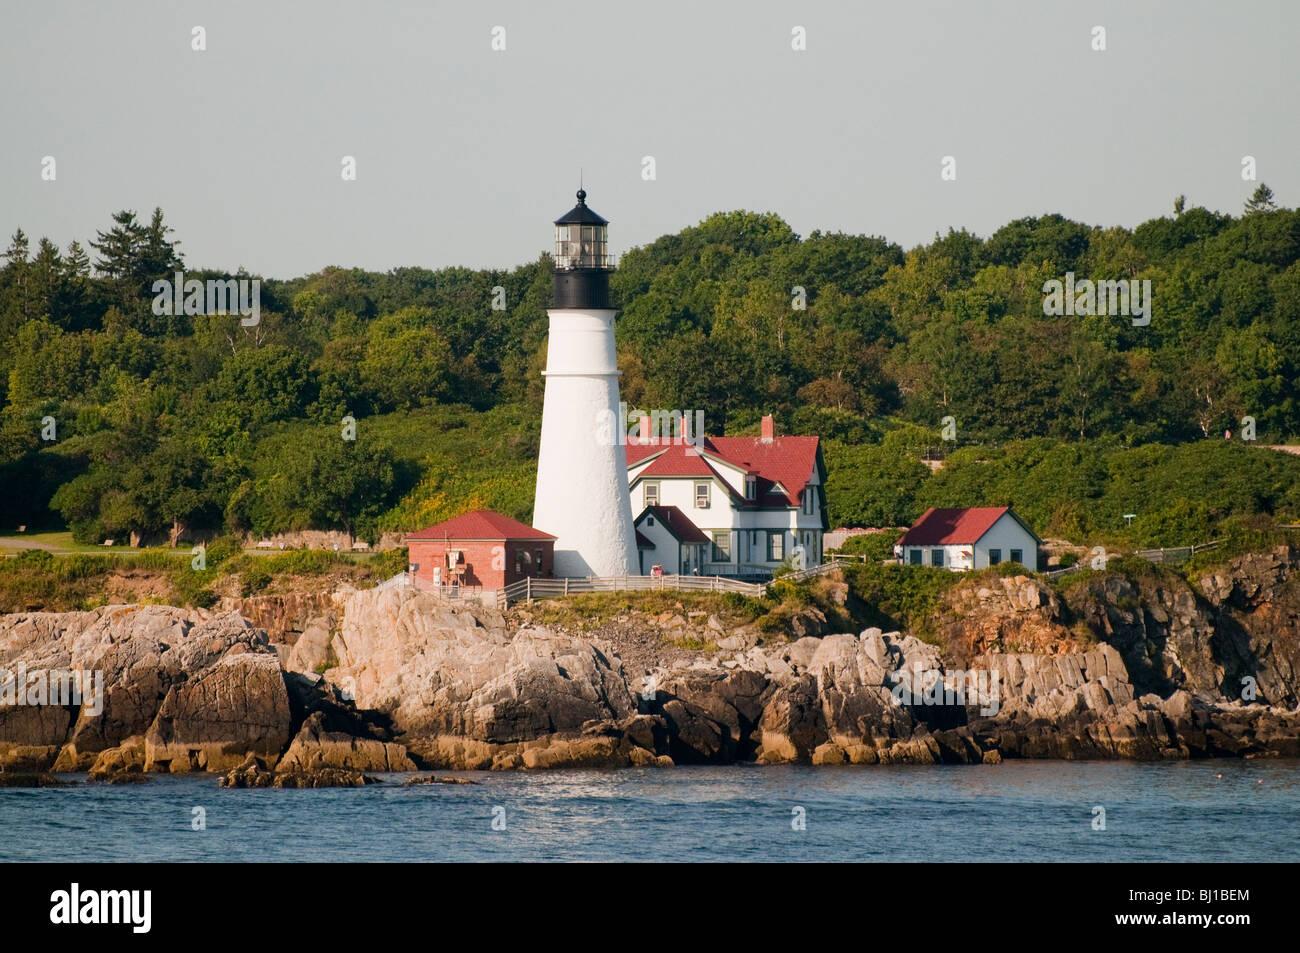 Maine portland head lighthouse along rocky shoreline for Bjs portland maine